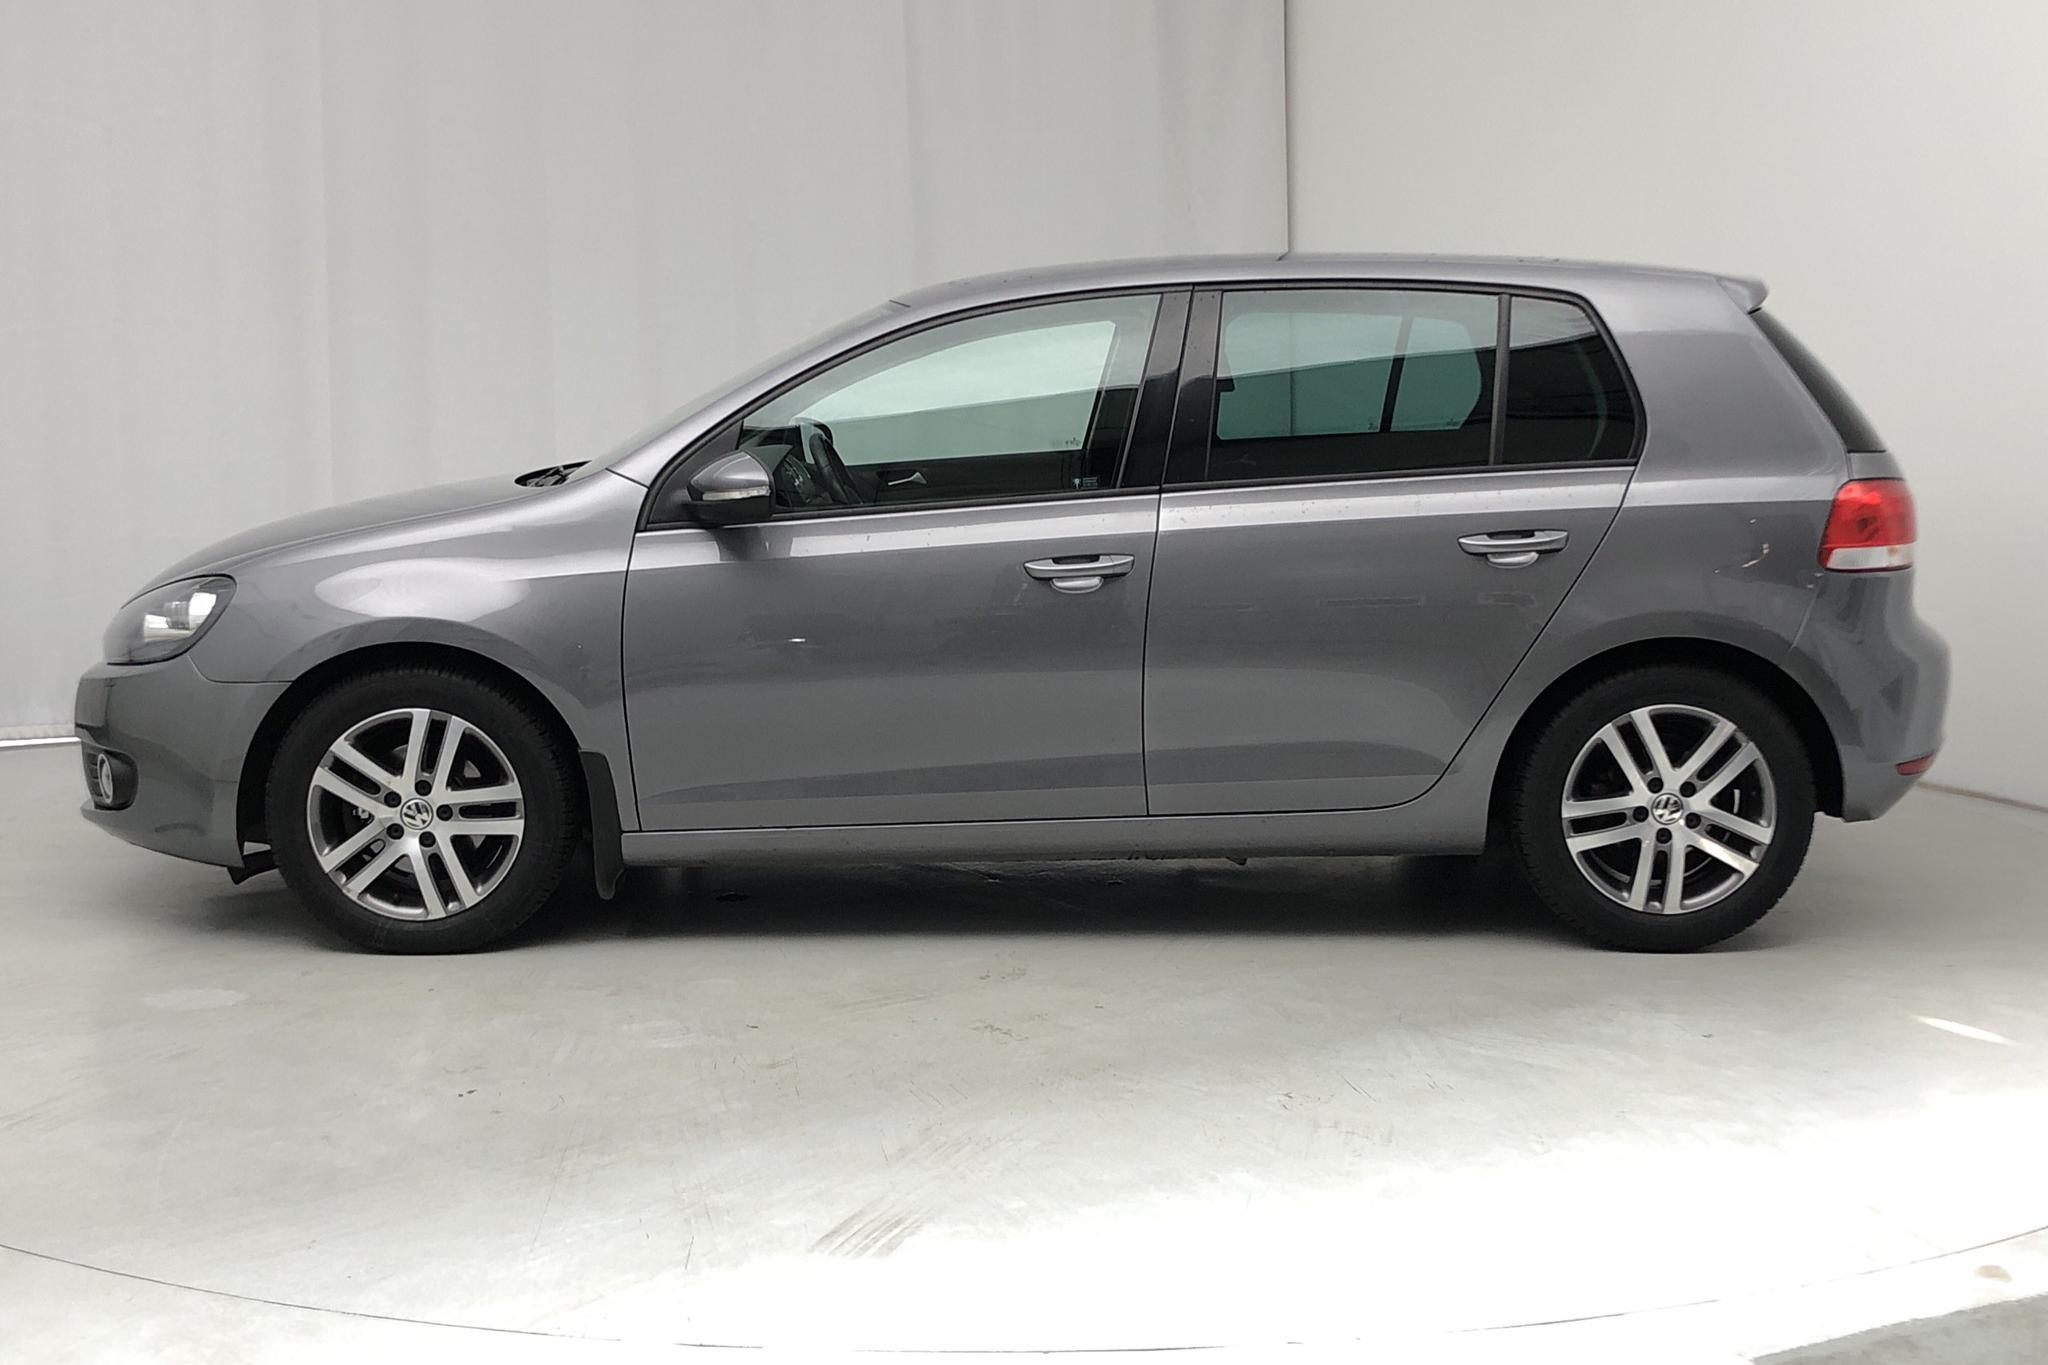 VW Golf VI 1.6 TDI BlueMotion Technology 5dr (105hk) - 104 000 km - Manual - gray - 2011